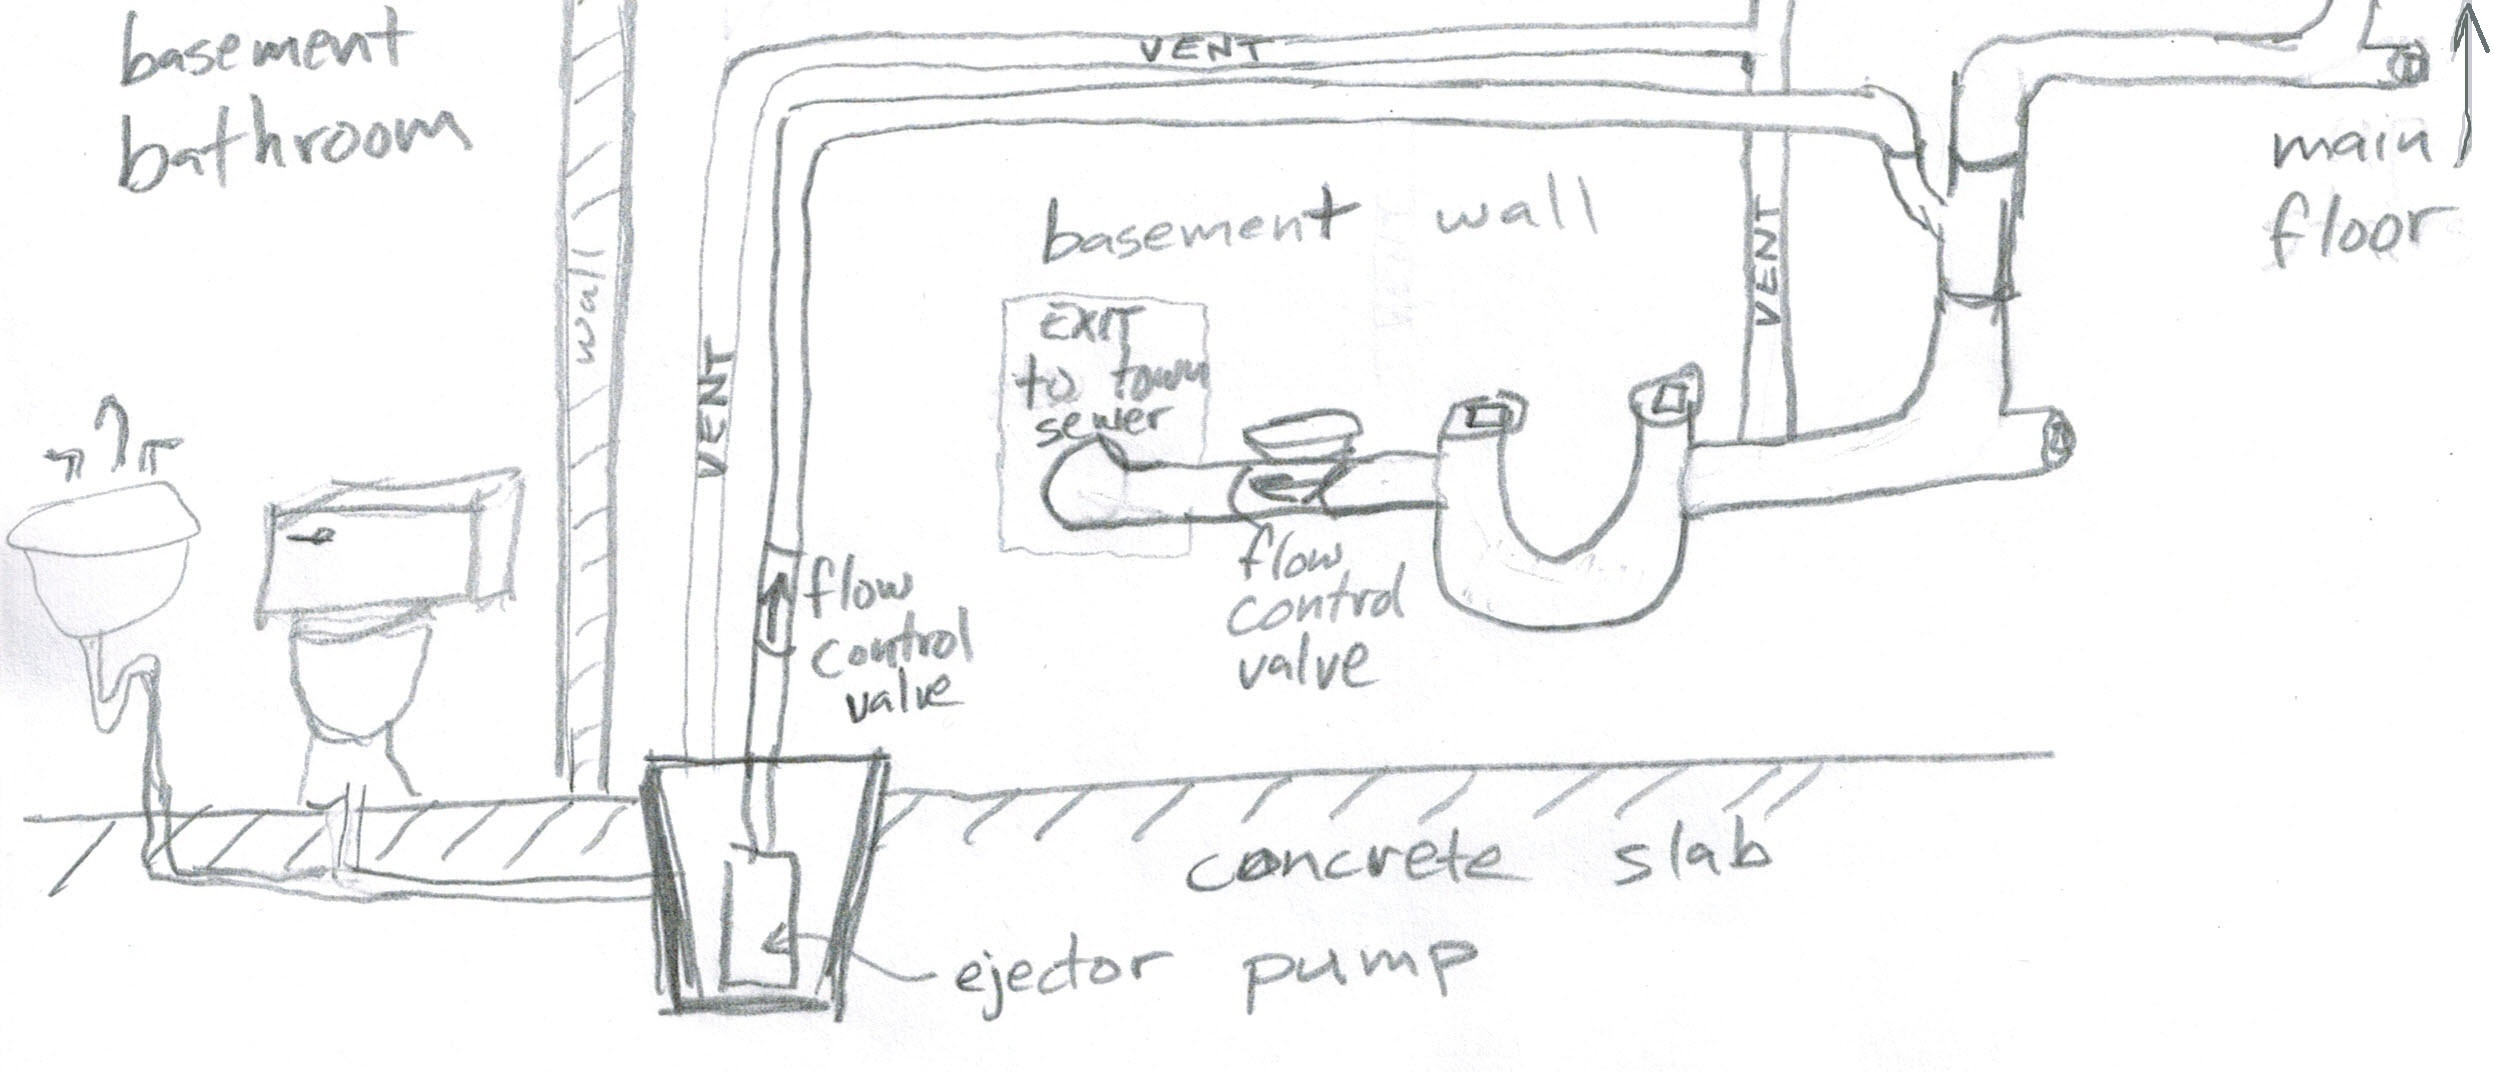 Sewage Ejector Pump For Basement